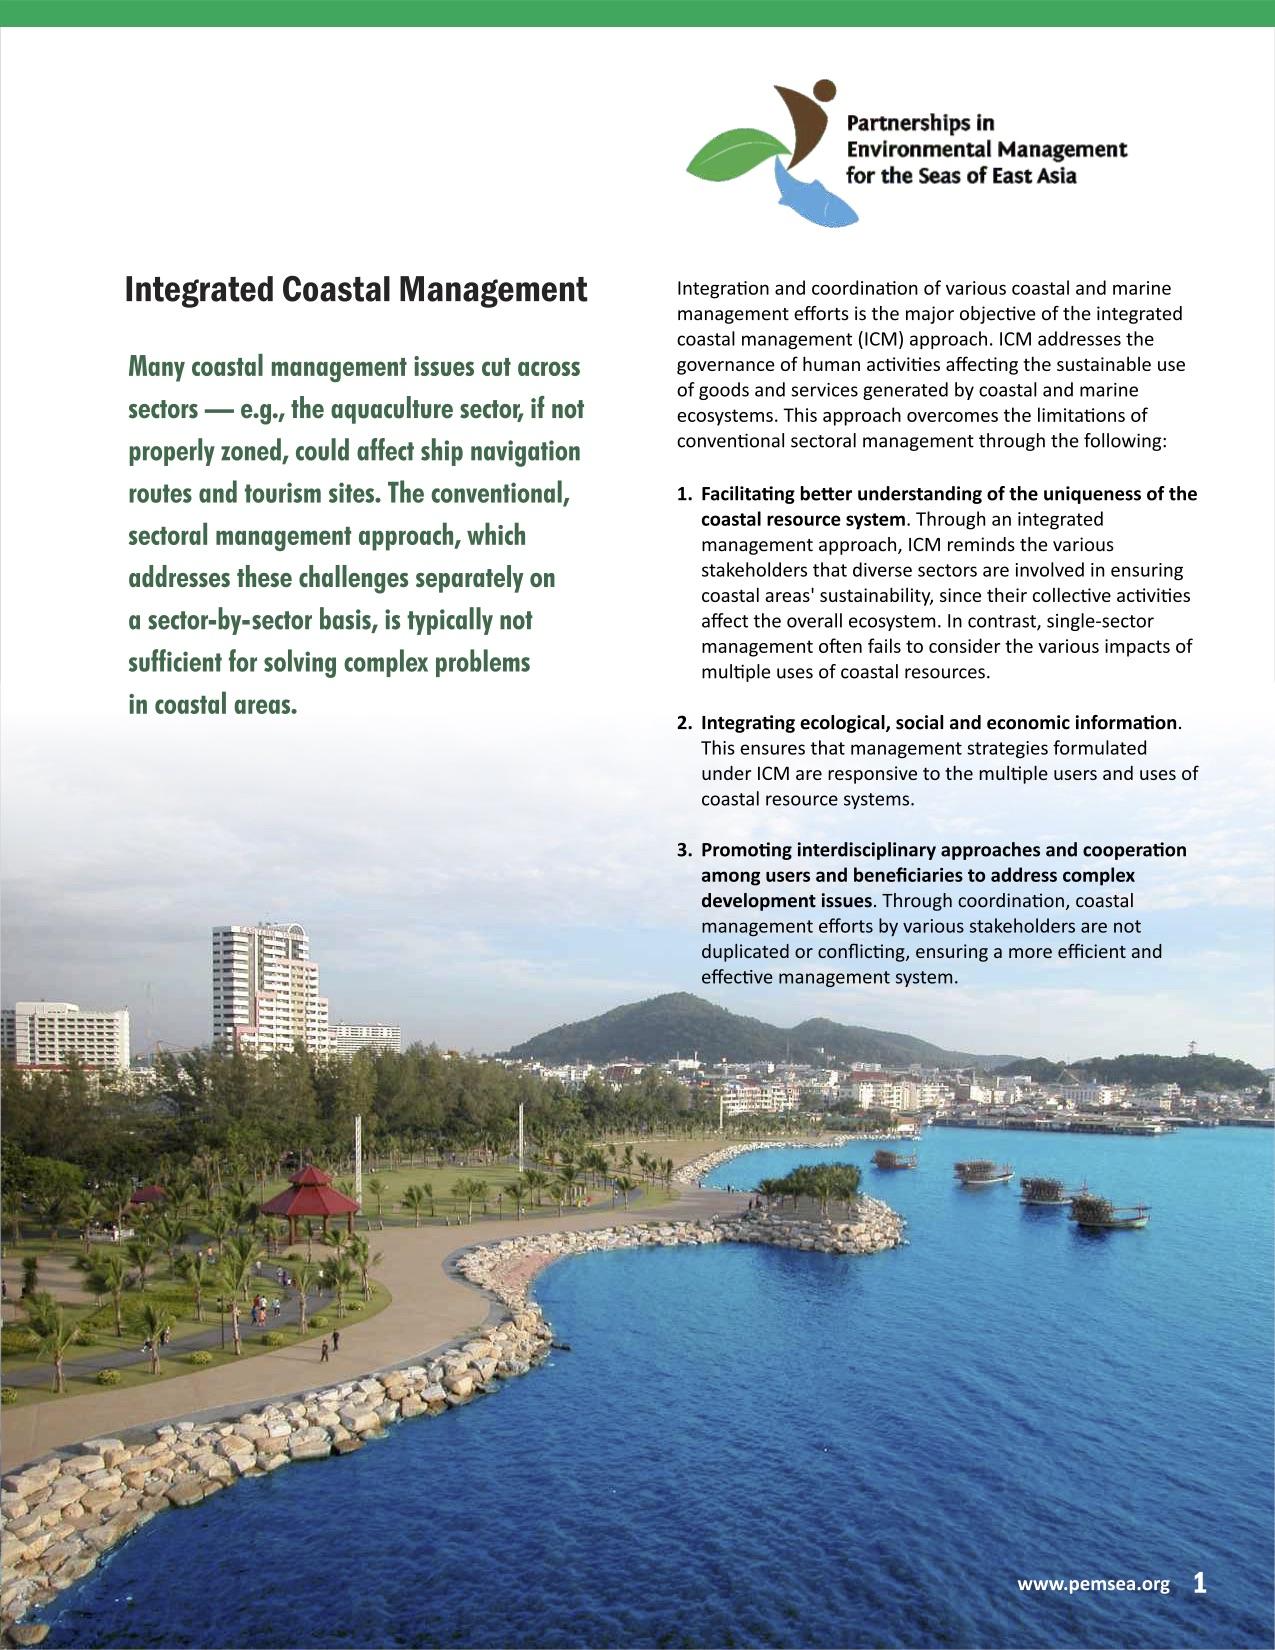 Integrated Coastal Management [Brochure, 2015] | PEMSEA